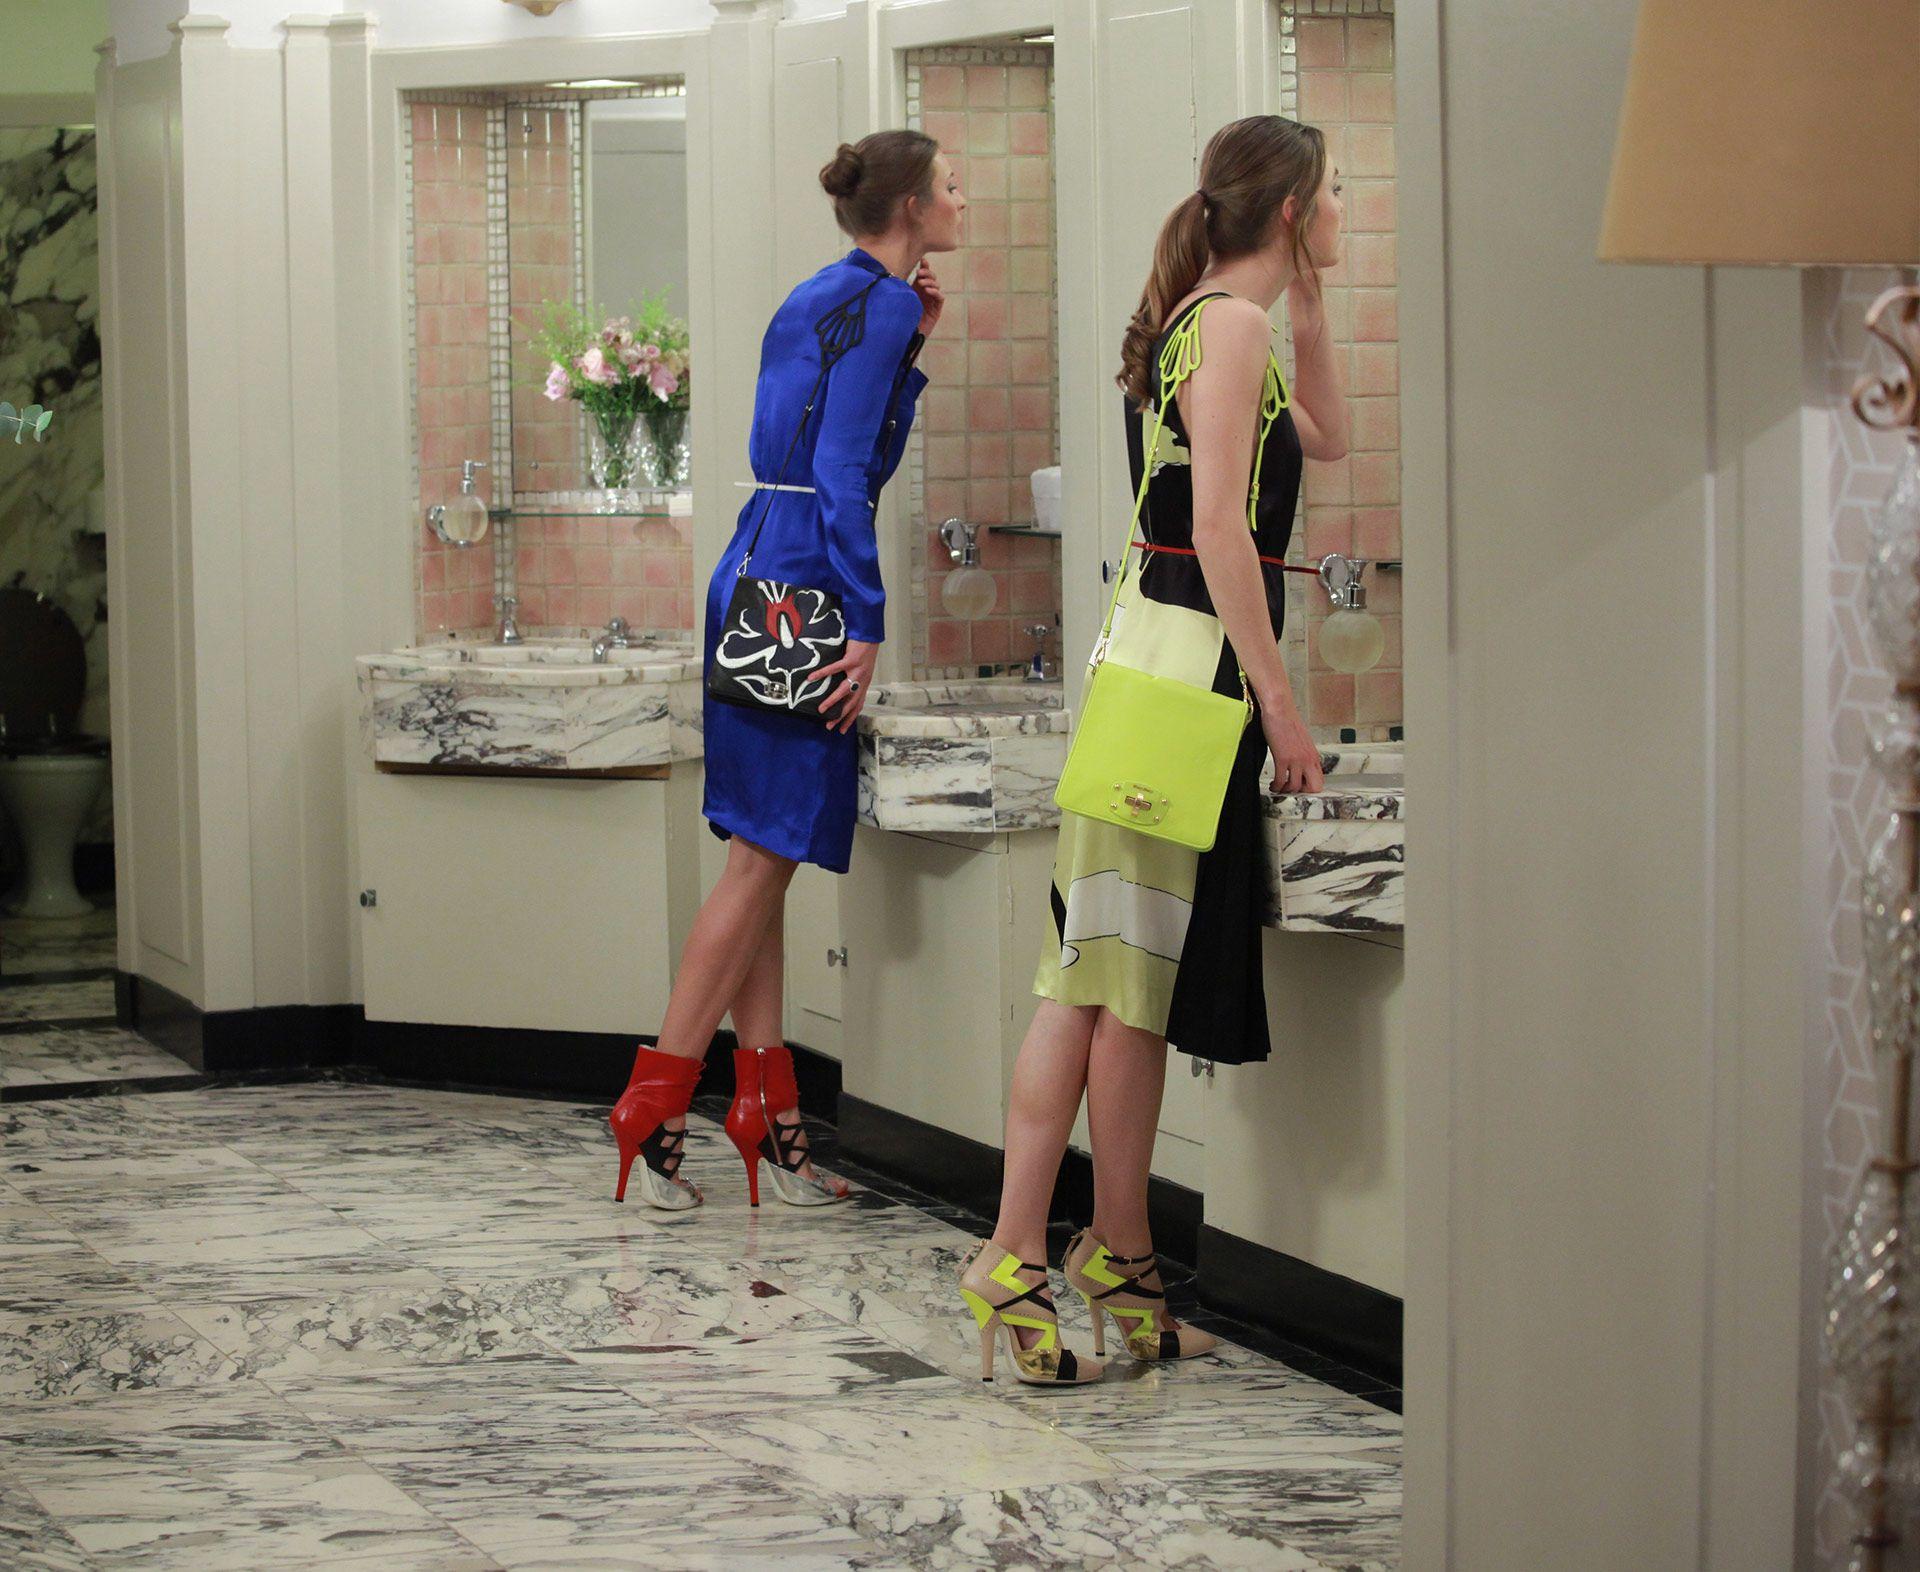 7 Fashion Short Films To Binge Watch This Weekend